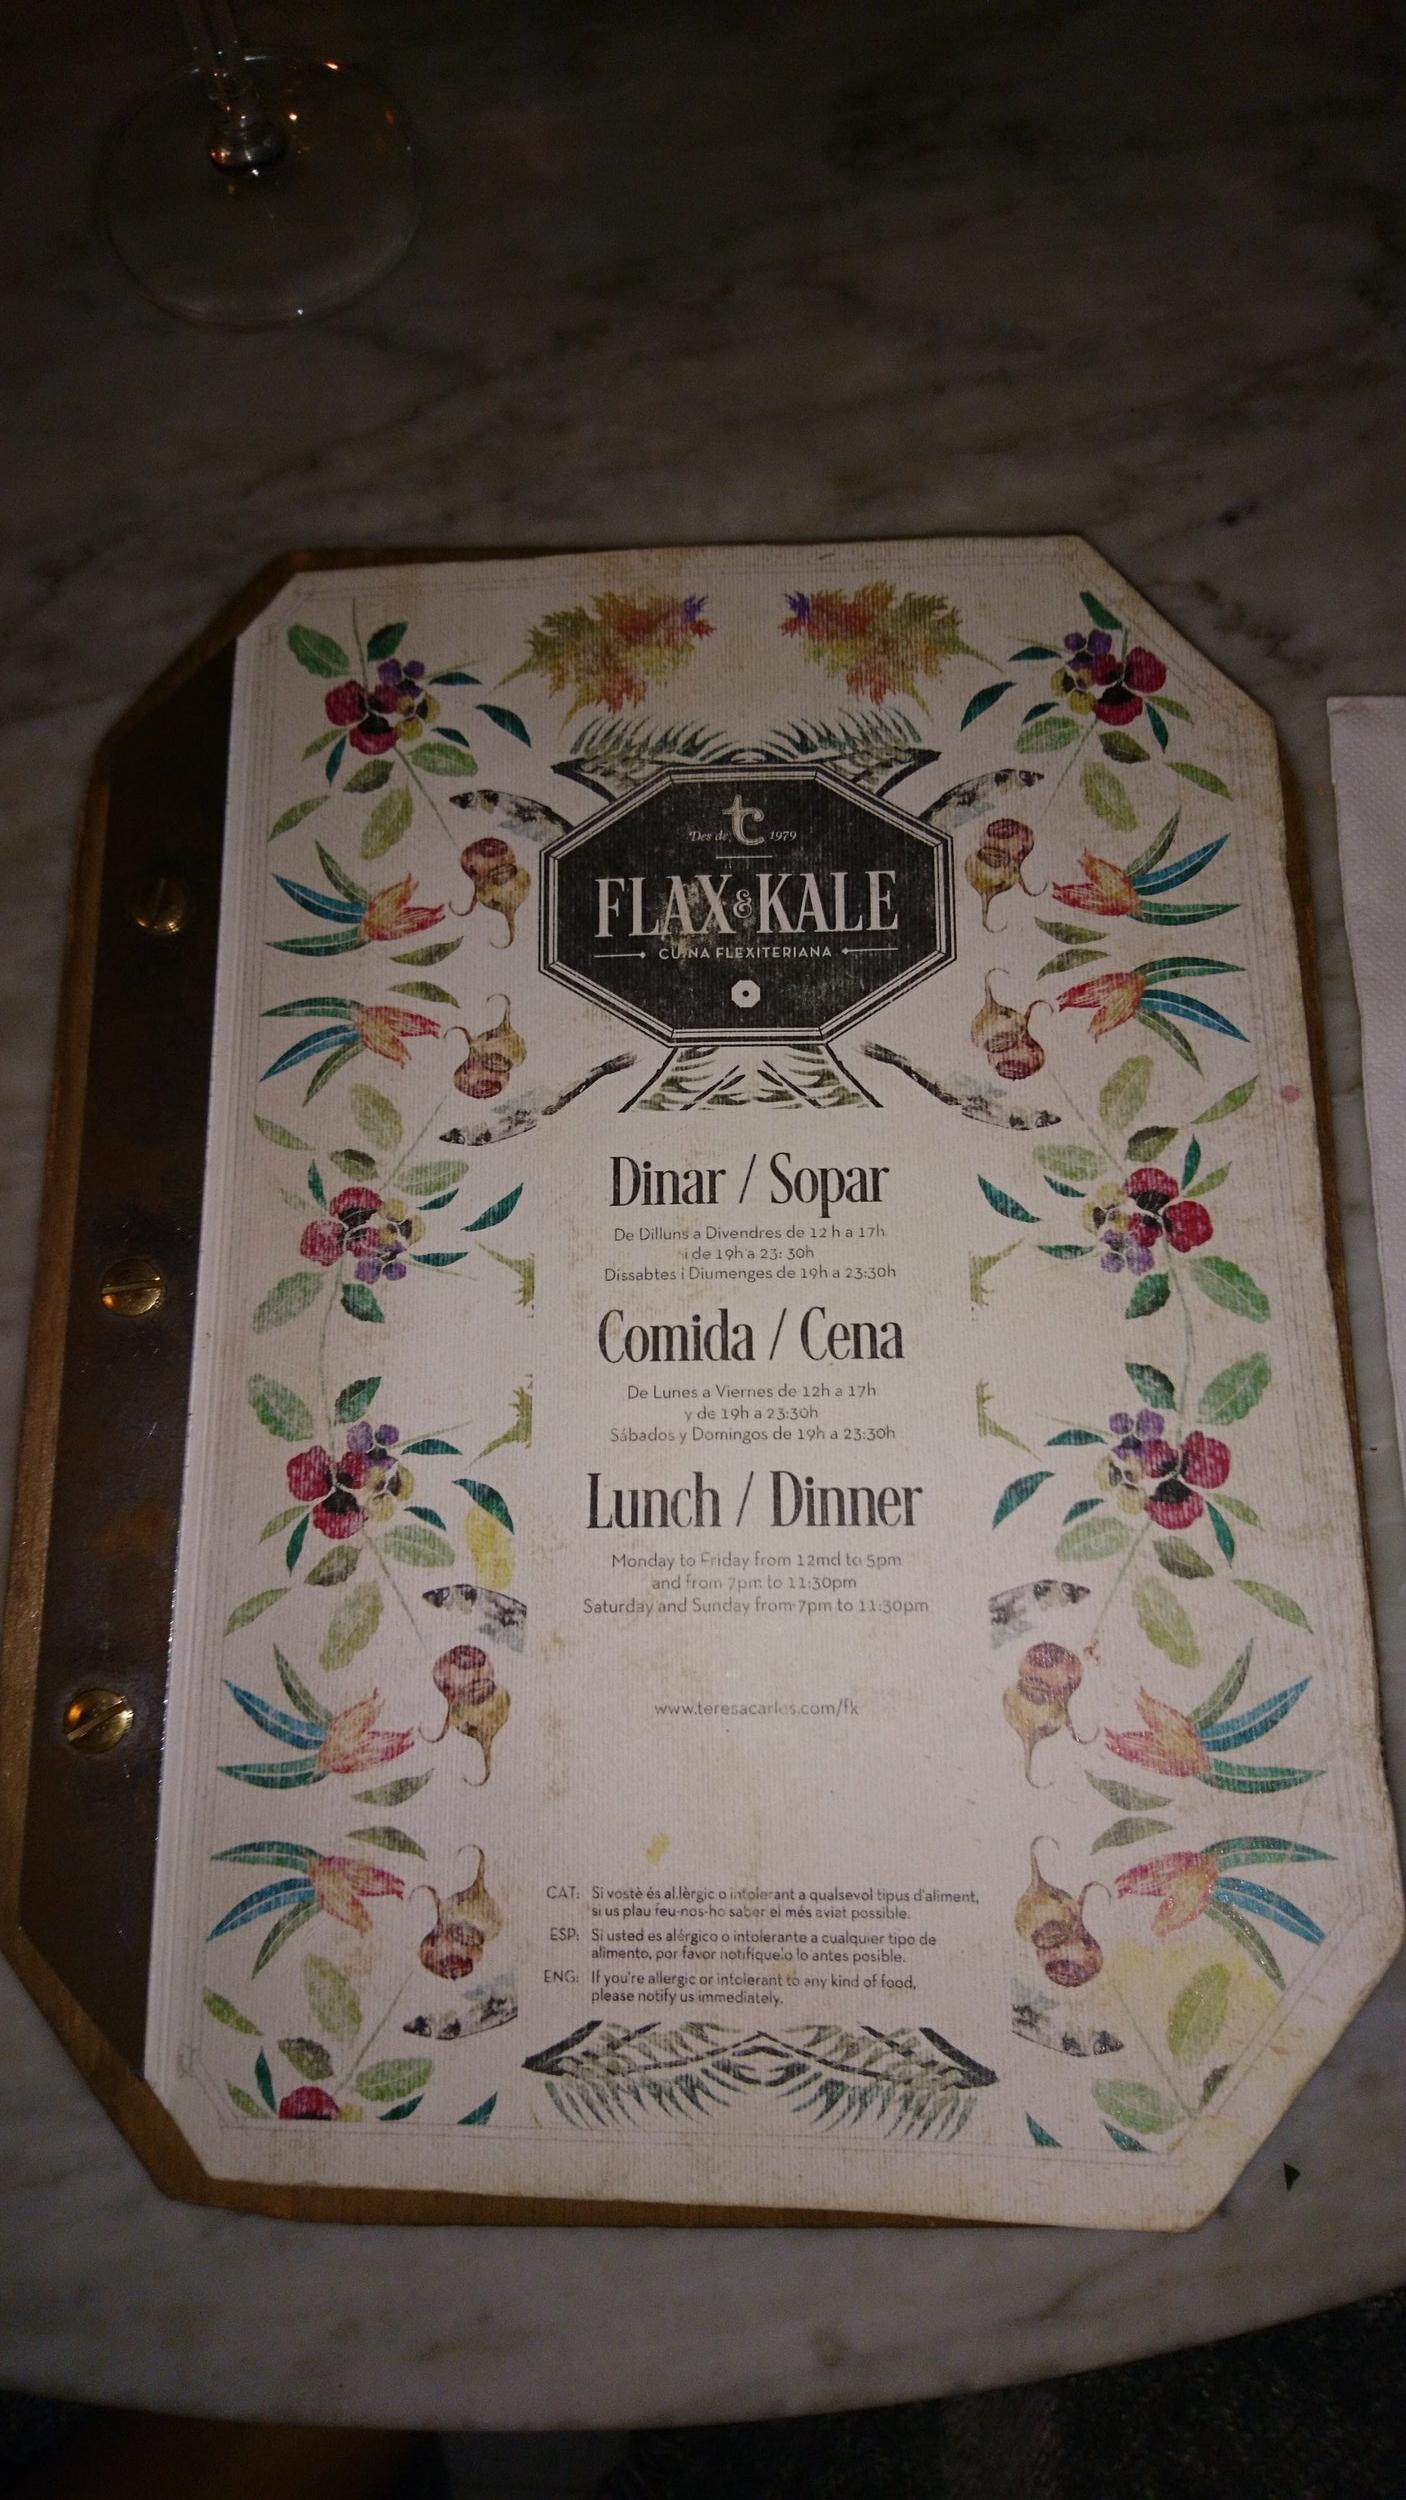 Flax and Kale menu